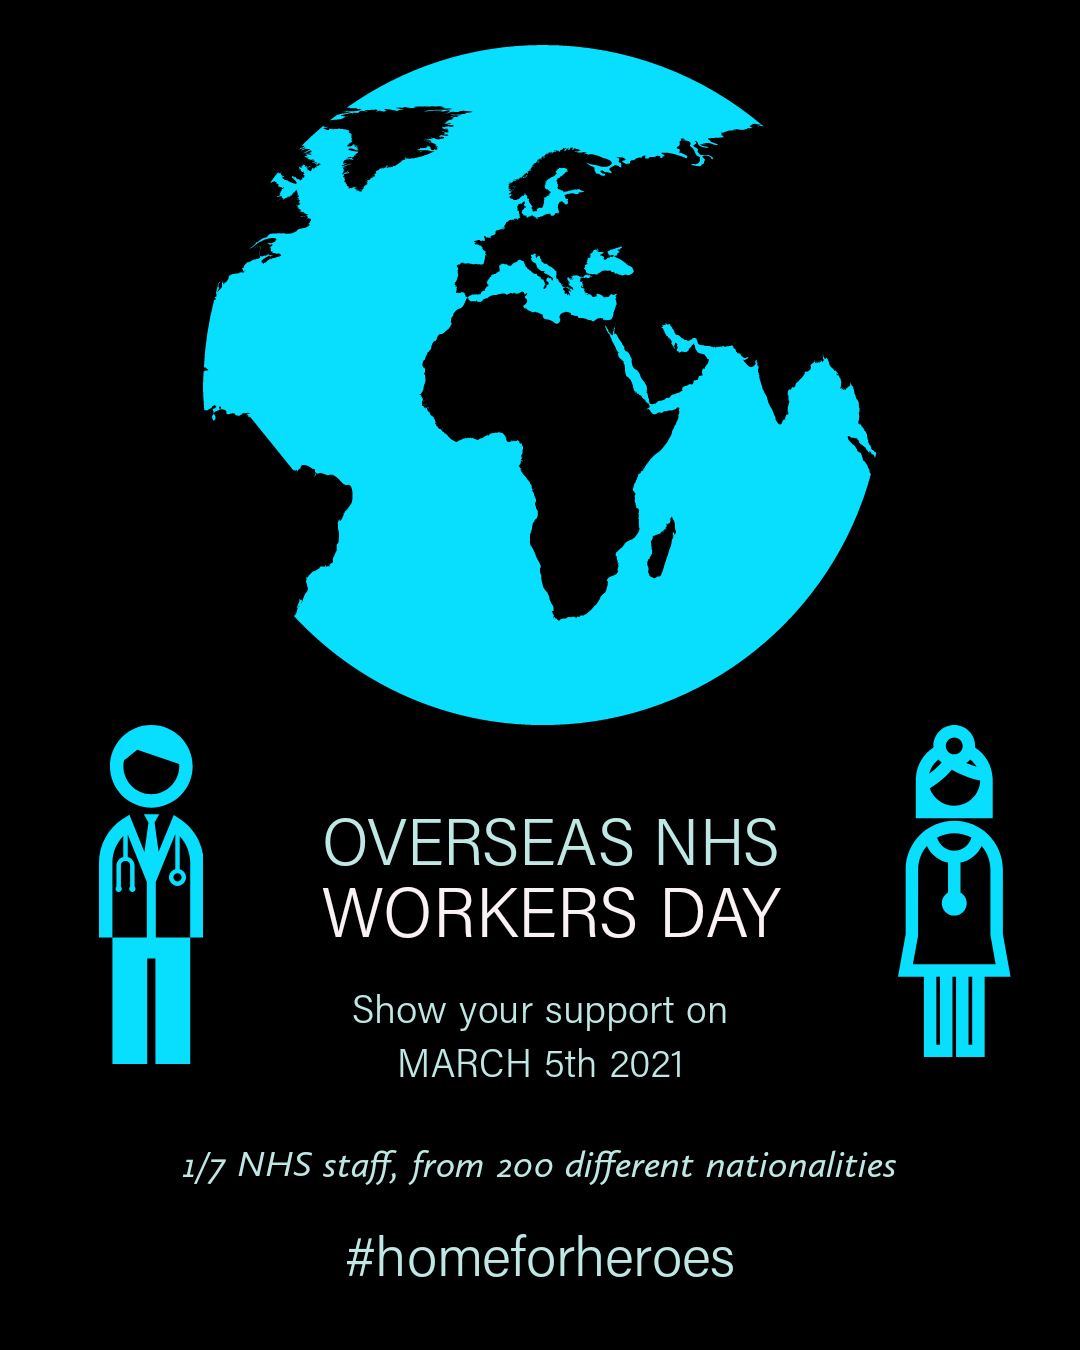 DAUK's Overseas NHS Workers Day recognised in UK Parliament